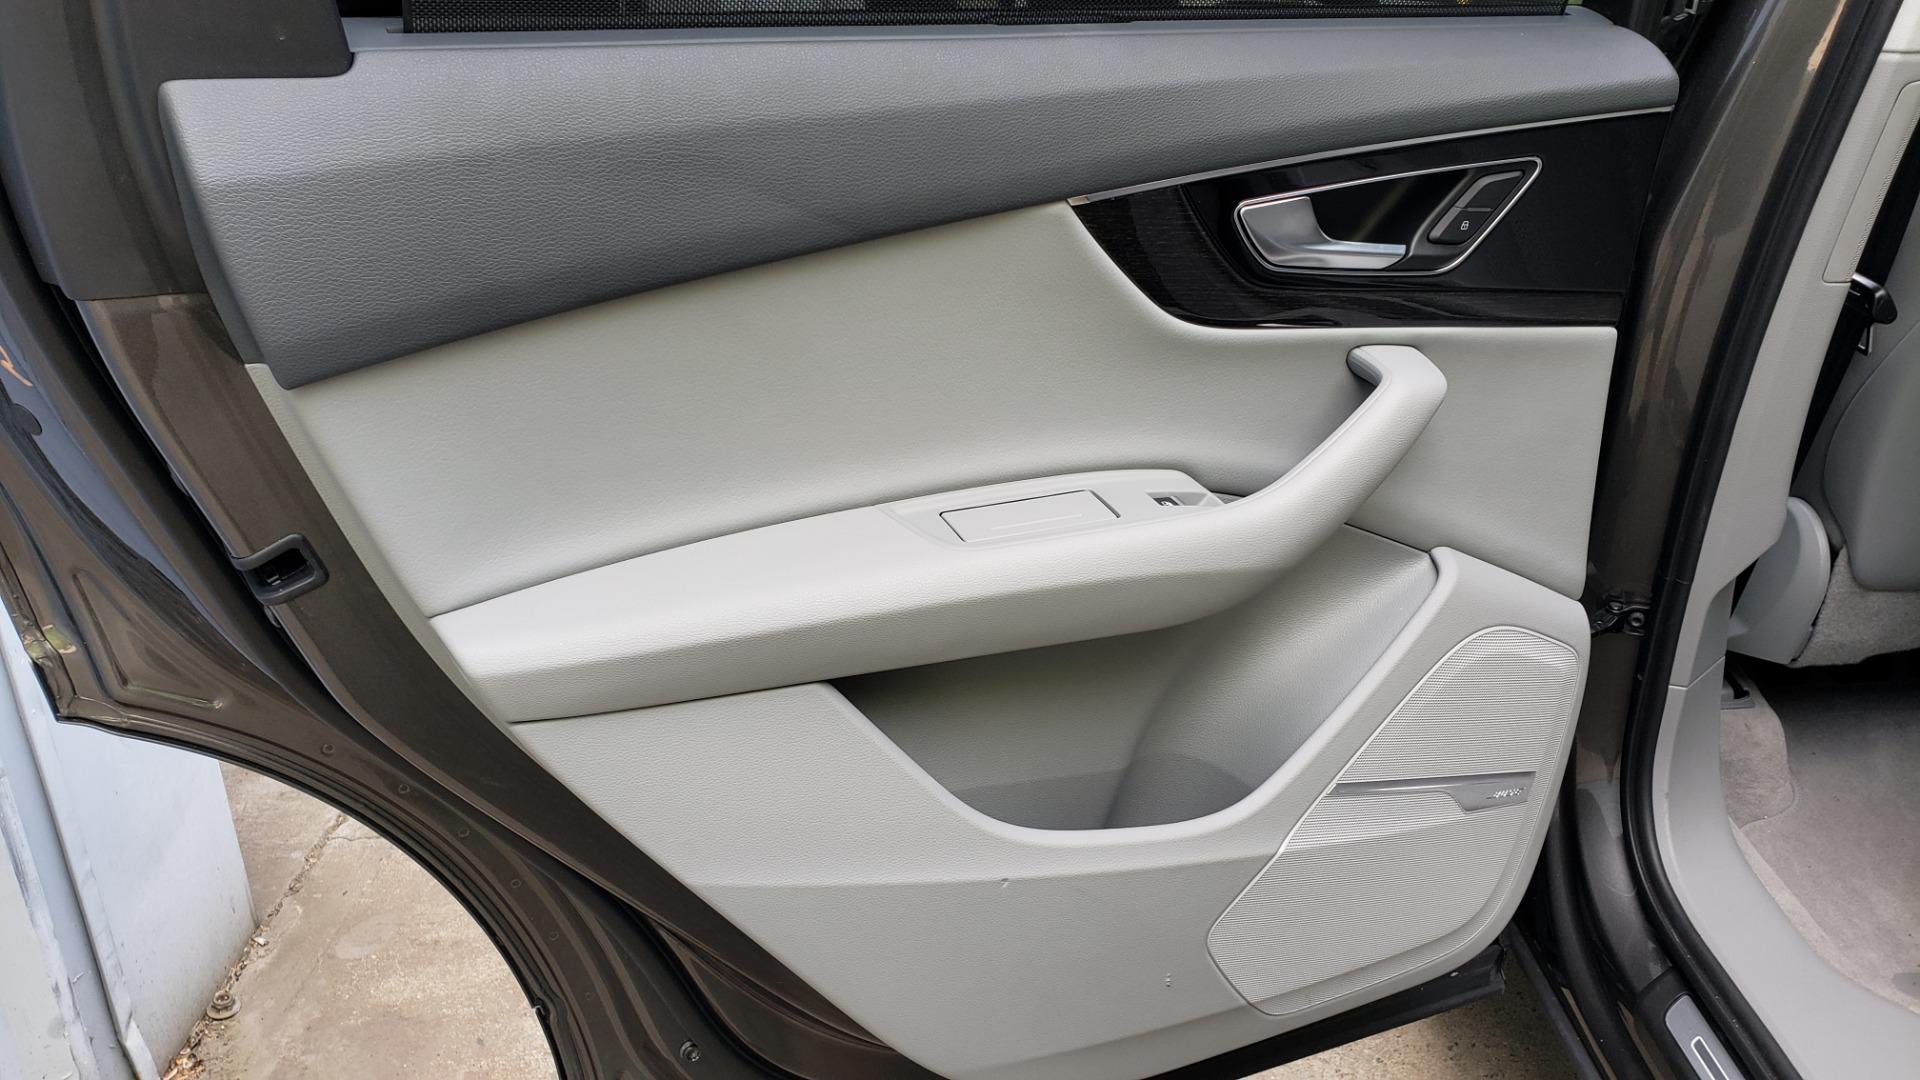 Used 2018 Audi Q7 PRESTIGE TIPTRONIC / NAV / SUNROOF / ADAPTIVE PKG / DRVR ASST / CLD WTHR /  for sale $49,995 at Formula Imports in Charlotte NC 28227 57